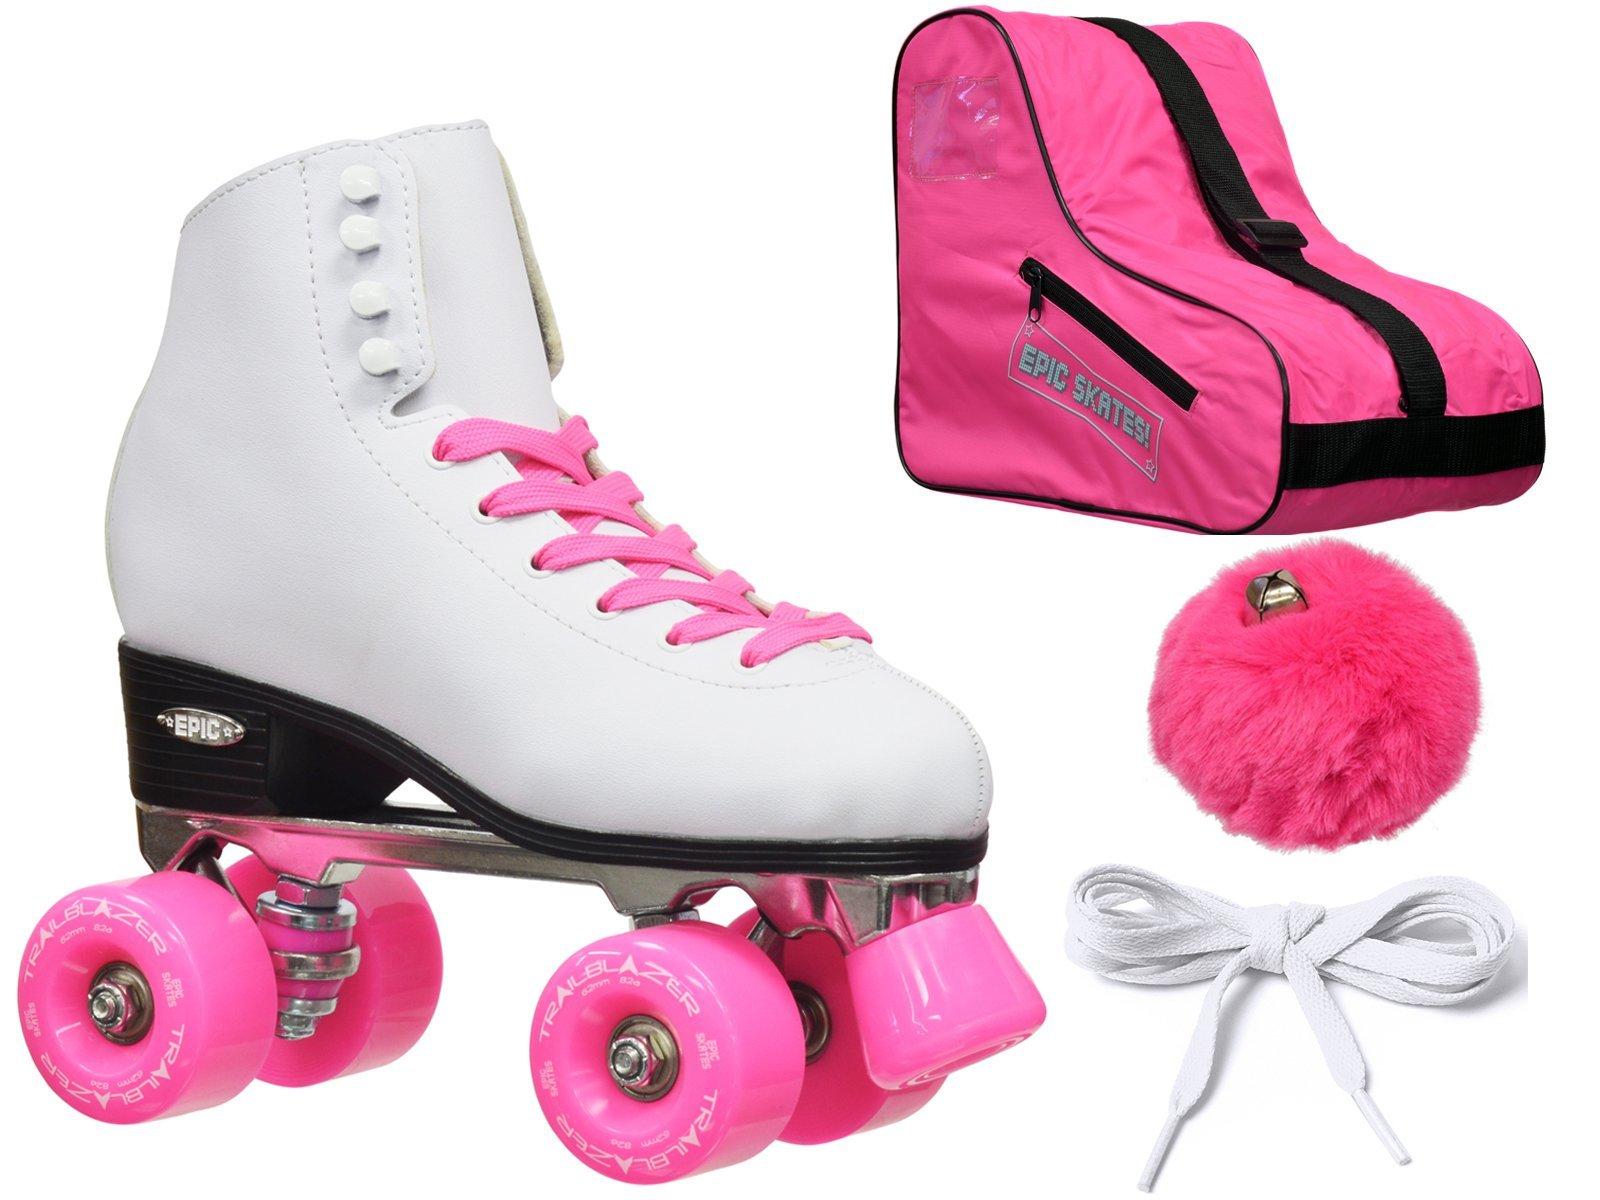 New! Epic Classic White & Pink High-Top Quad Roller Skate Bundle w/ Bag, Laces, & Pom Poms! (Ladies 6)